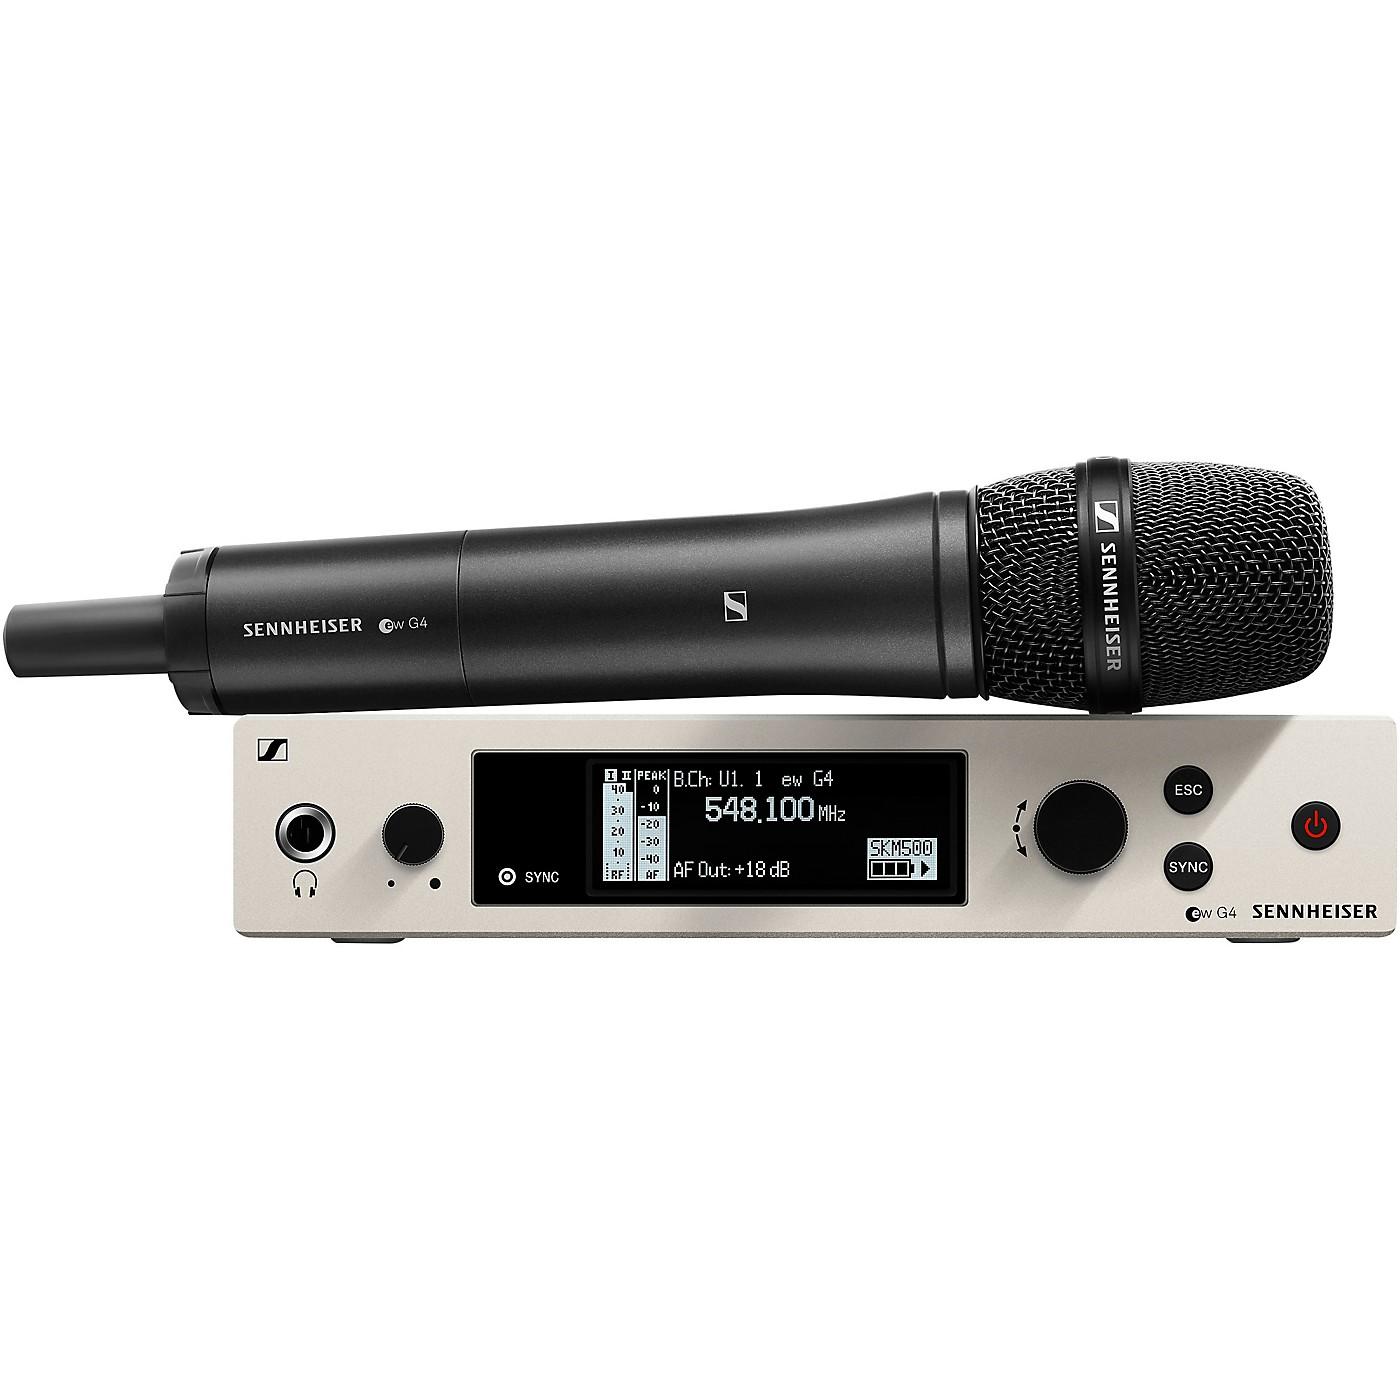 Sennheiser EW 500 G4-935 Wireless Handheld Microphone System thumbnail